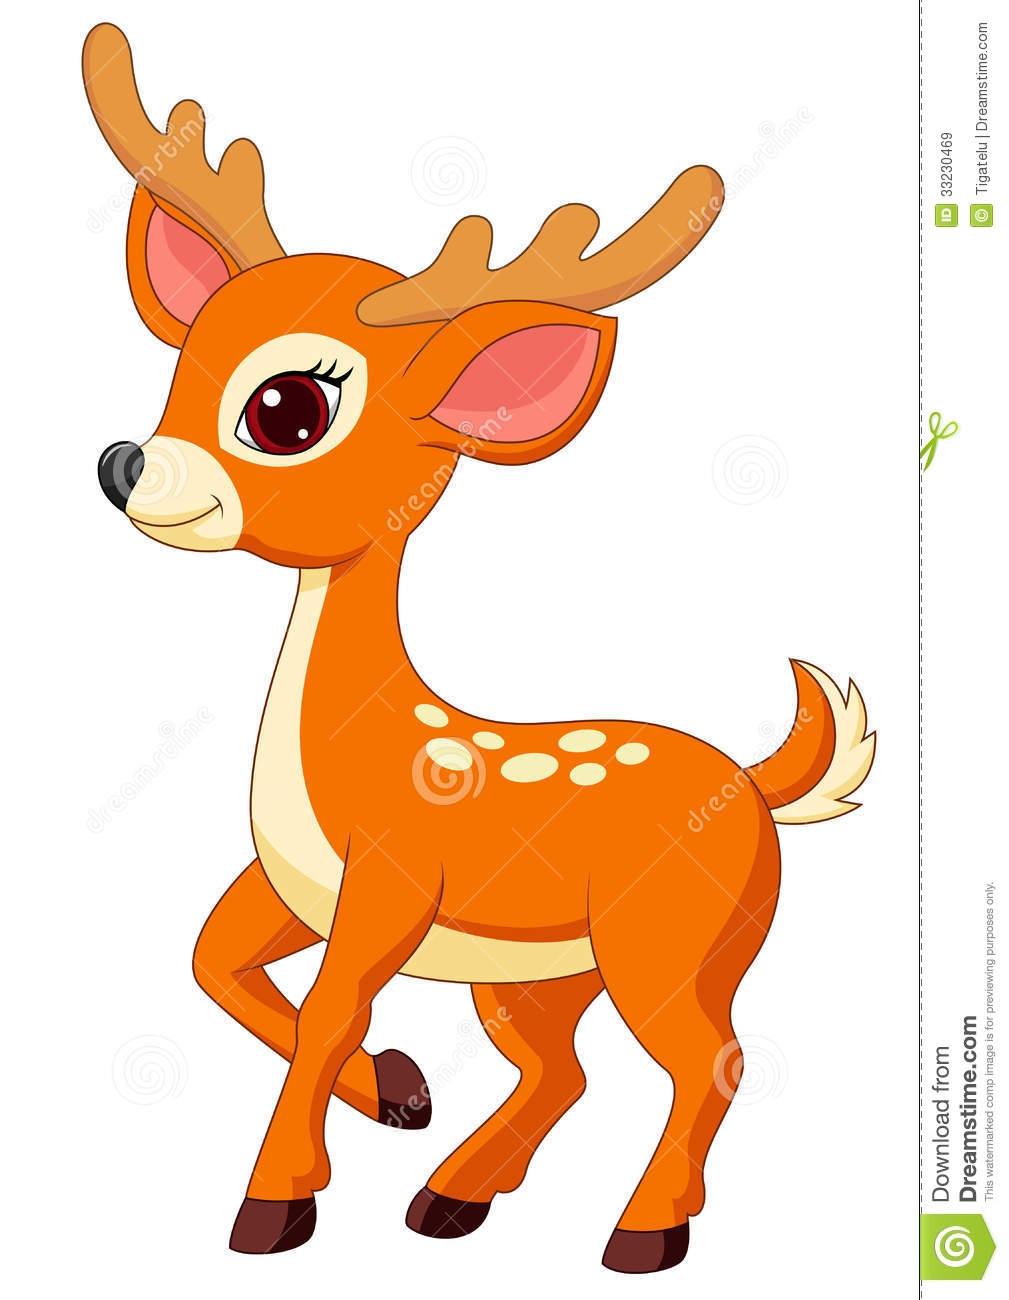 ... 1aabb007c932c9df04acc3267b56e7; baby deer clipart 3 clip art ...